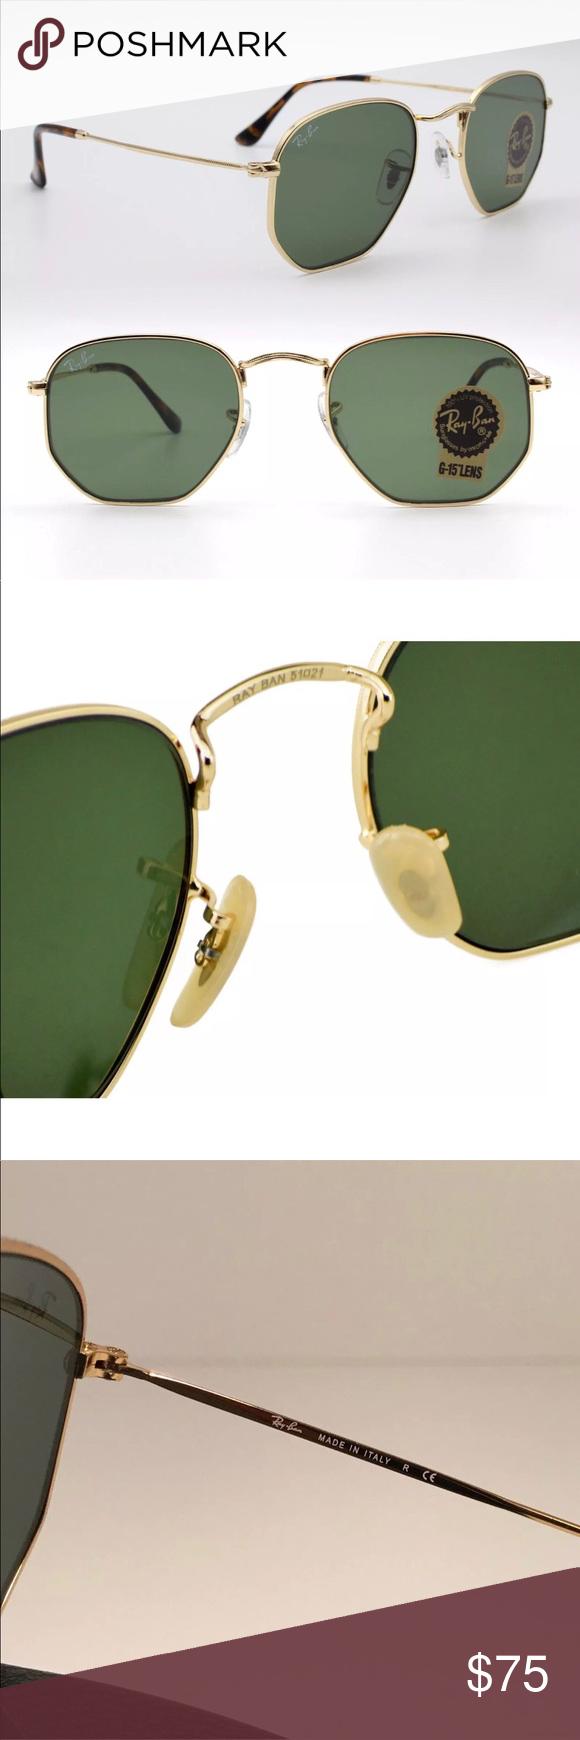 ec2437421a778 Ray-Ban hexagonal sunglasses green lens gold frame Ray-Ban Hexagonal  Sunglasses Classic Green G-15 Lens 51mm   Gold RB3548N 001 New Ray-Ban  Hexagonal flat ...